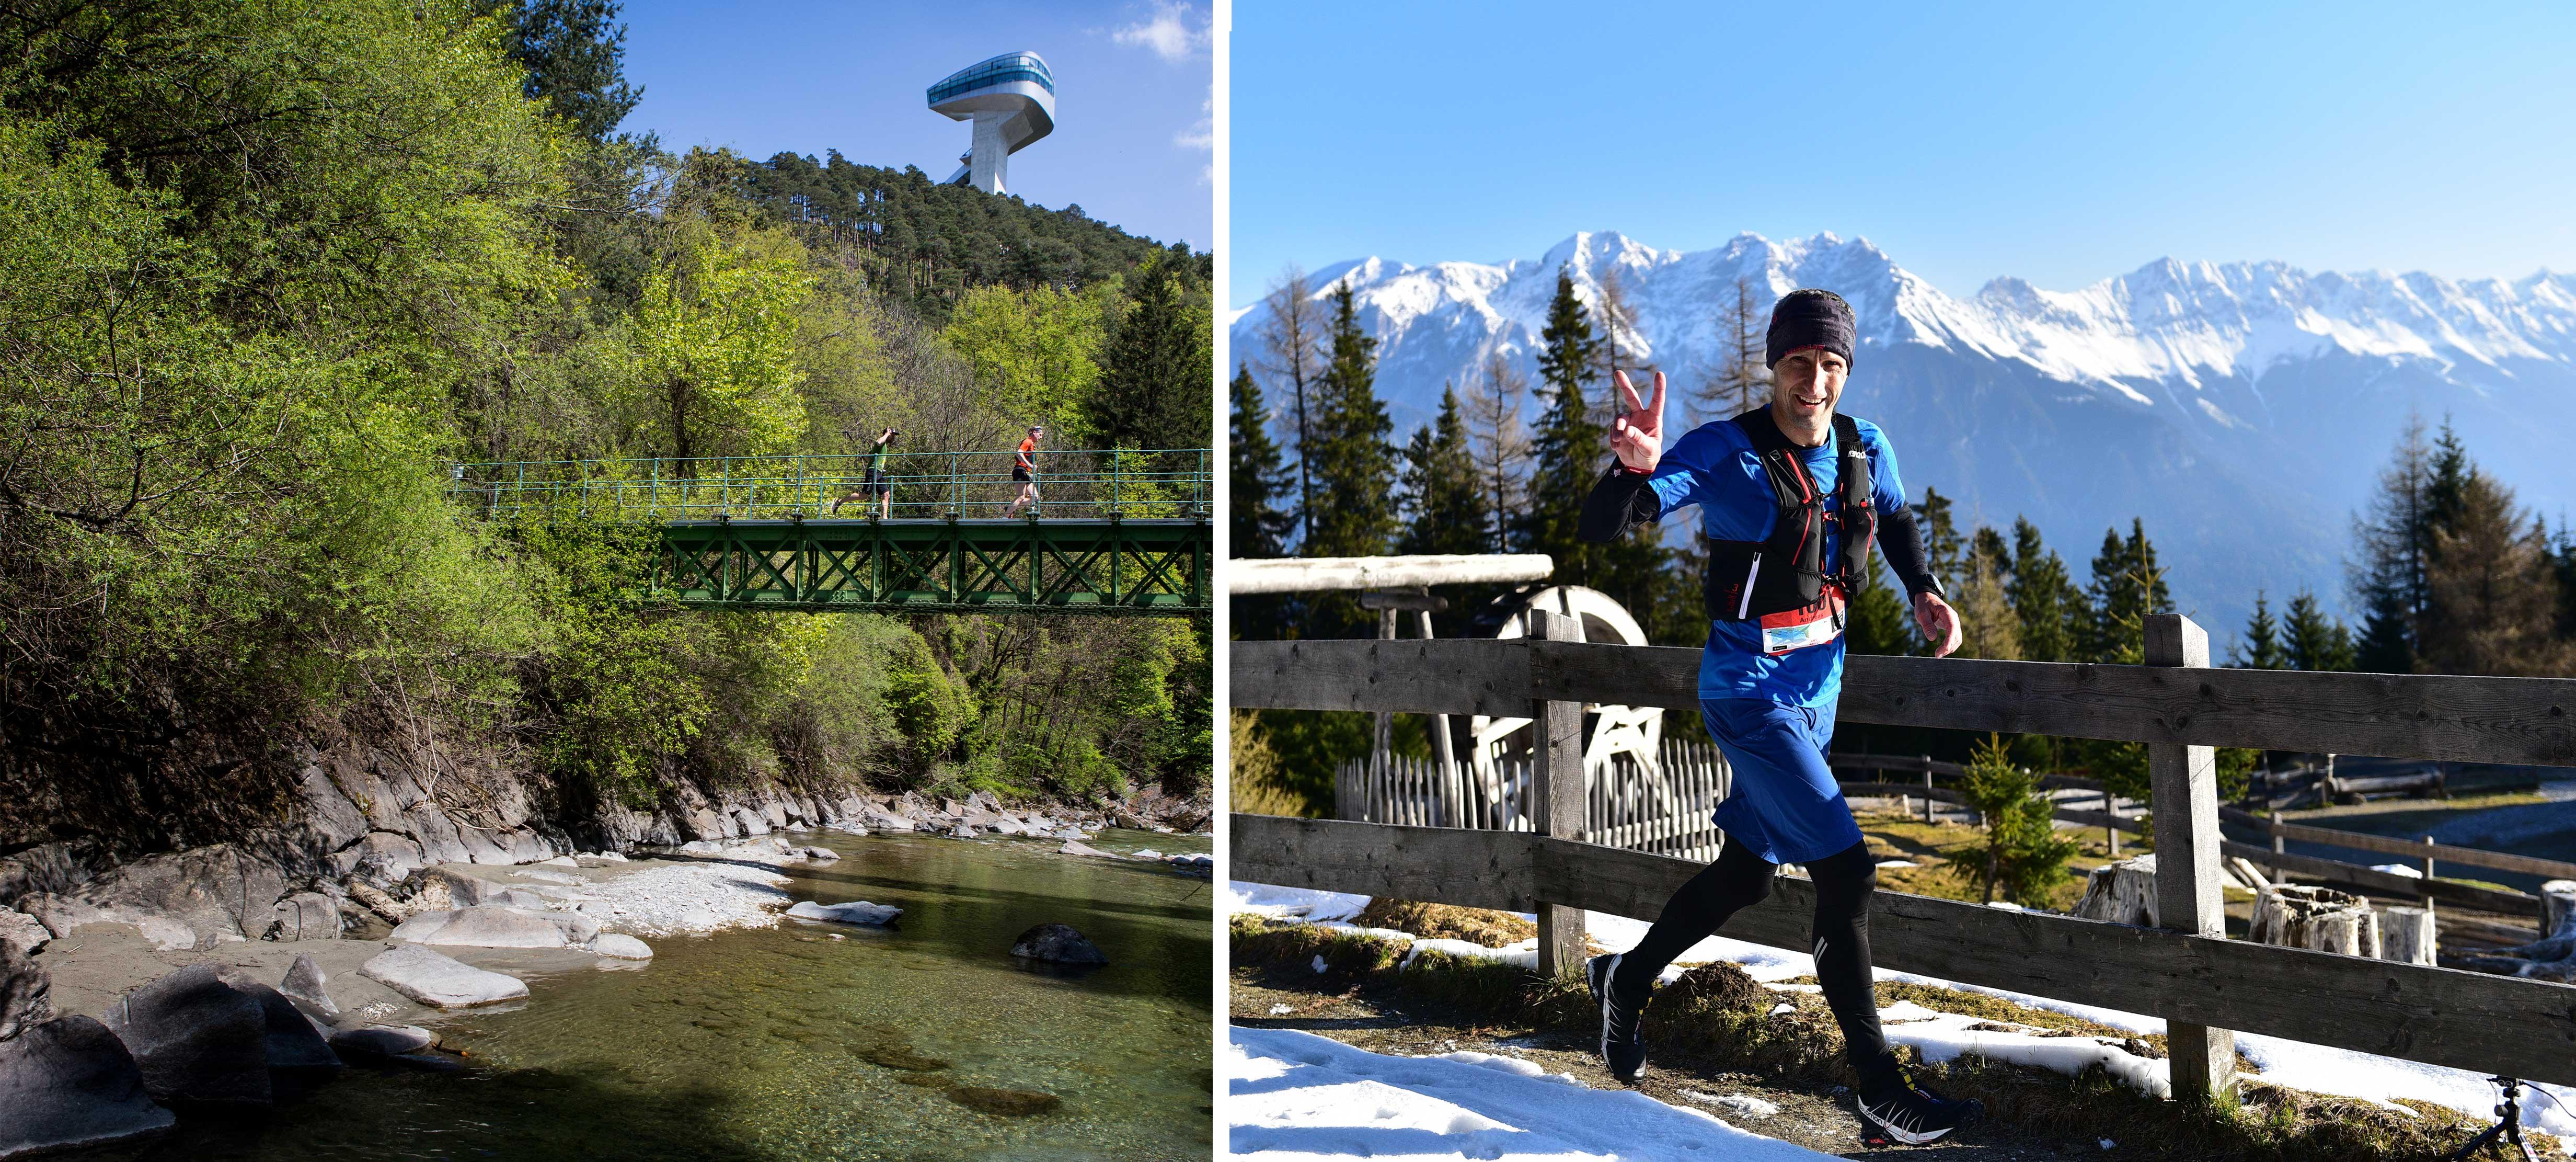 innsbruck-alpine-trailrun-frestival-panoramajpg